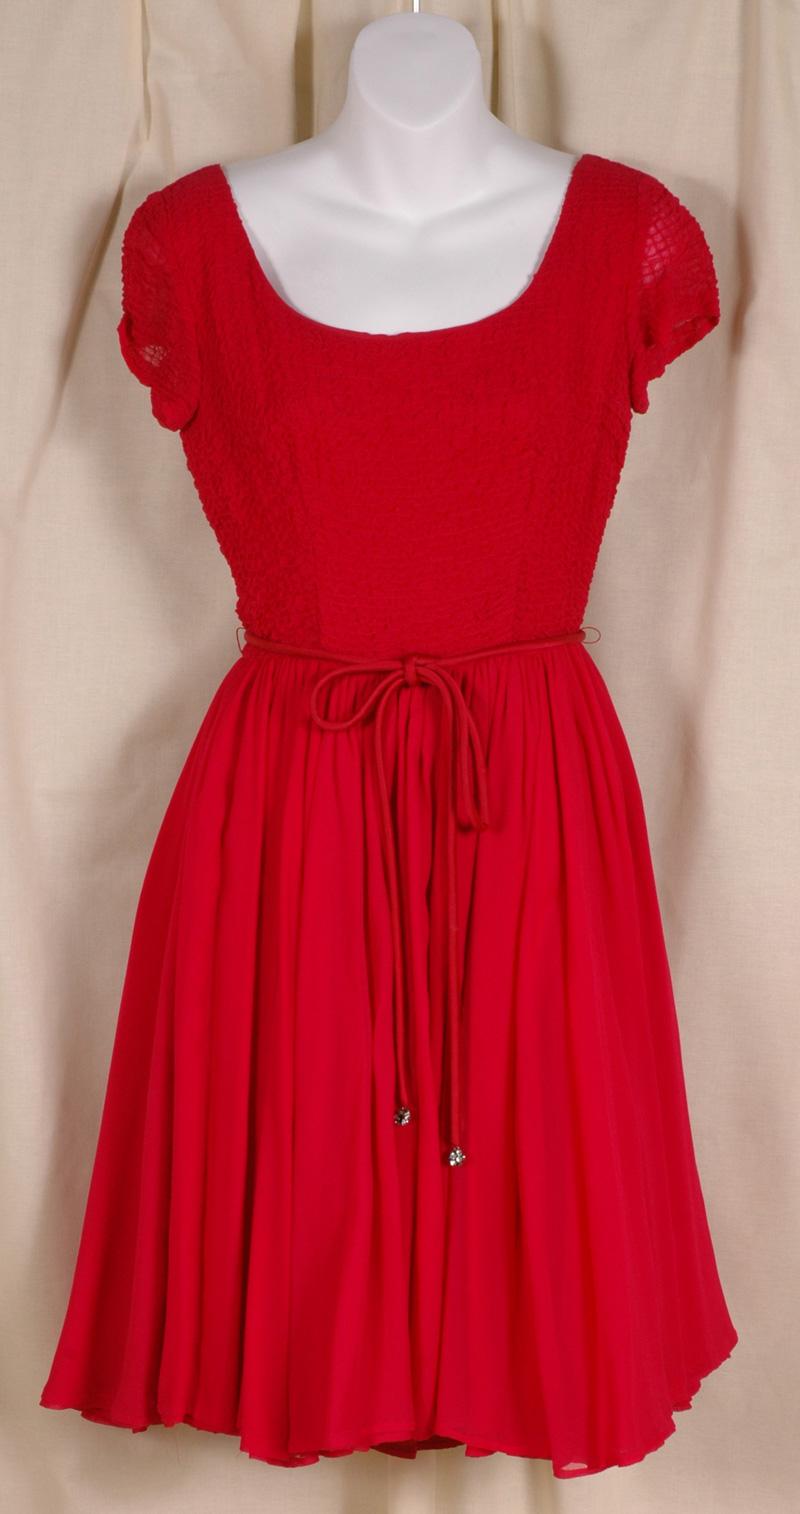 red dress - آداب میزبانی و میهمانی در بلندترین شب سال(یلدا)